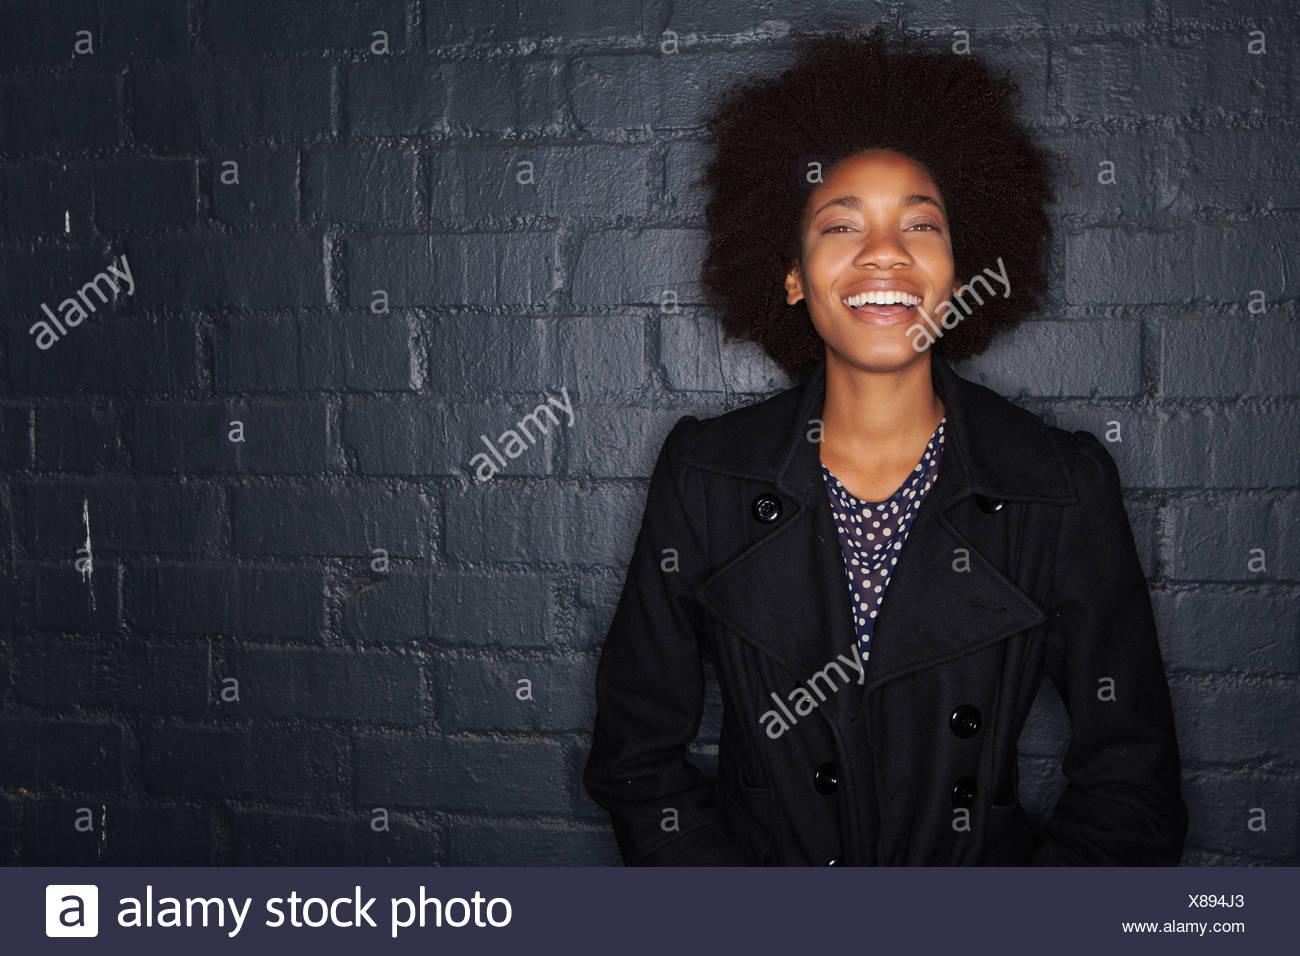 Young woman by black brick wall wearing black jacket - Stock Image